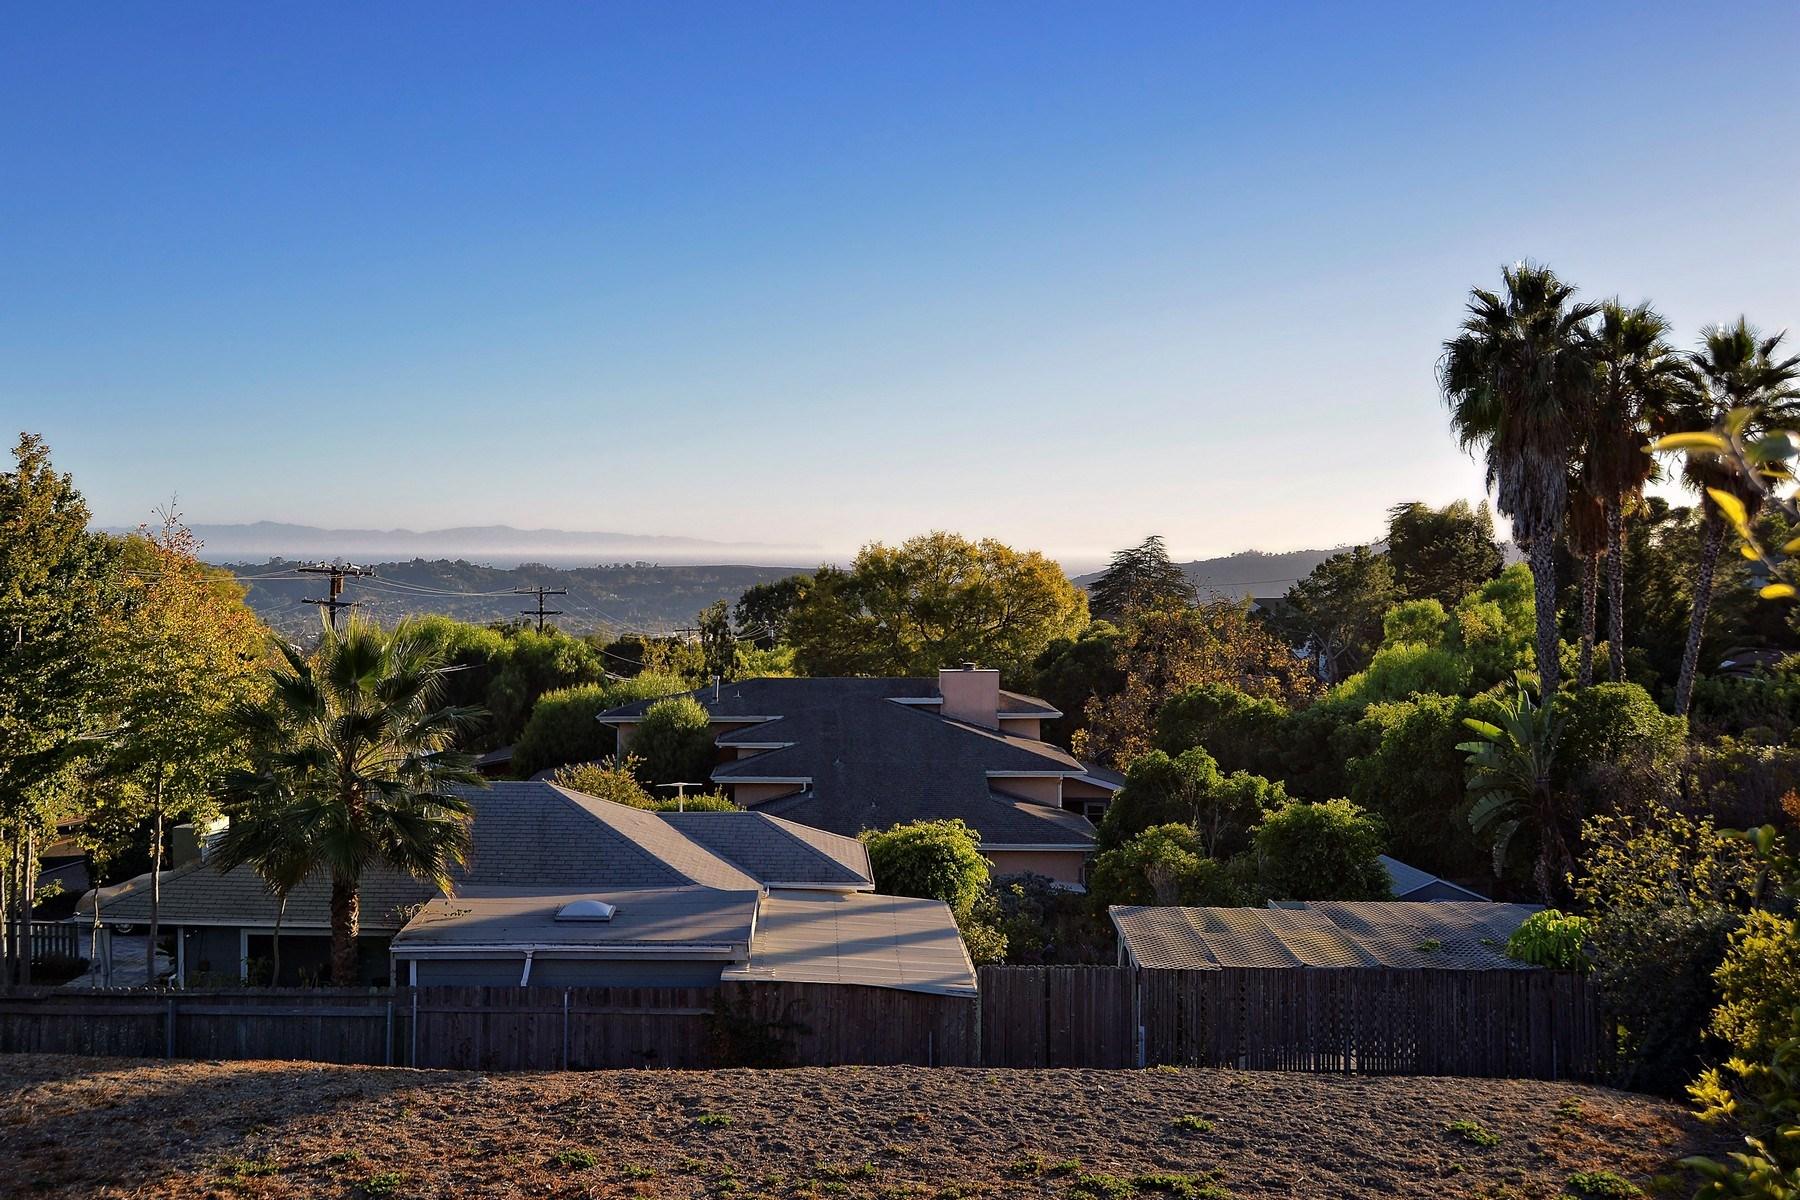 Terreno por un Venta en Desirable Santa Barbara Homesite 1021 Cheltenham Road Santa Barbara, California, 93101 Estados Unidos